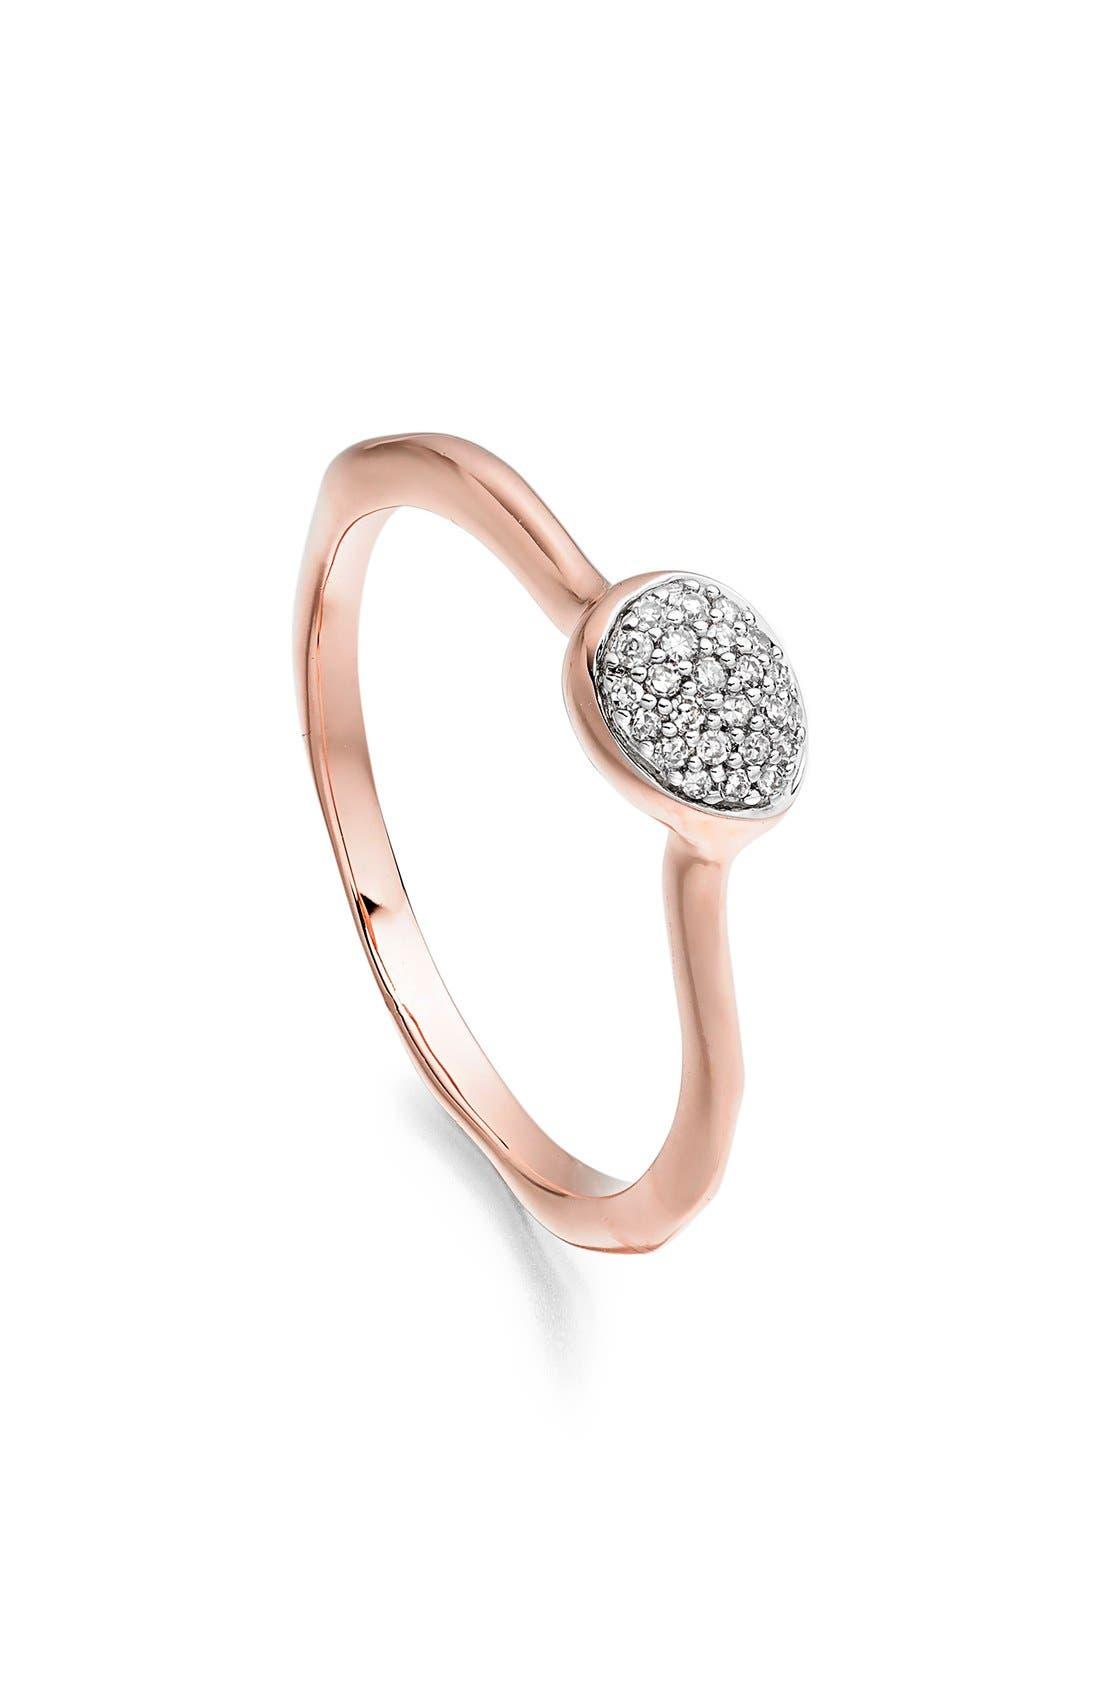 Main Image - Monica Vinader 'Siren' Small Pavé Diamond Stacking Ring